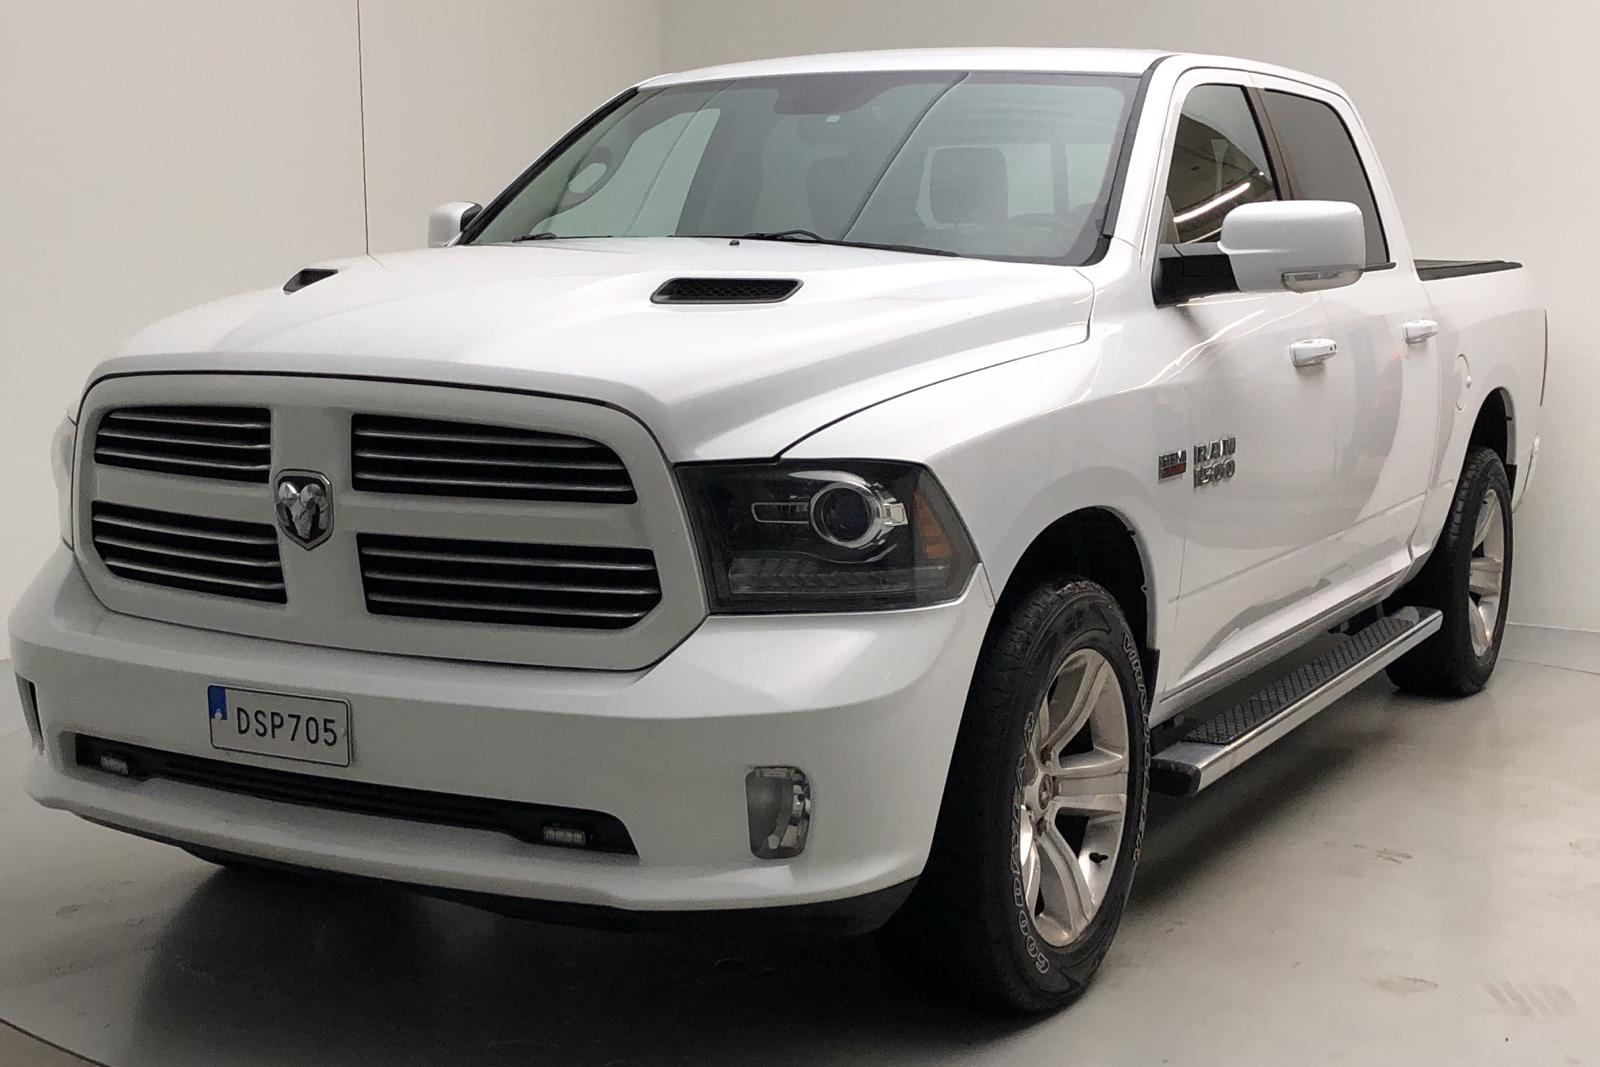 Dodge RAM 1500 5.7 4WD (401hk) - 94 000 km - Automatic - white - 2013